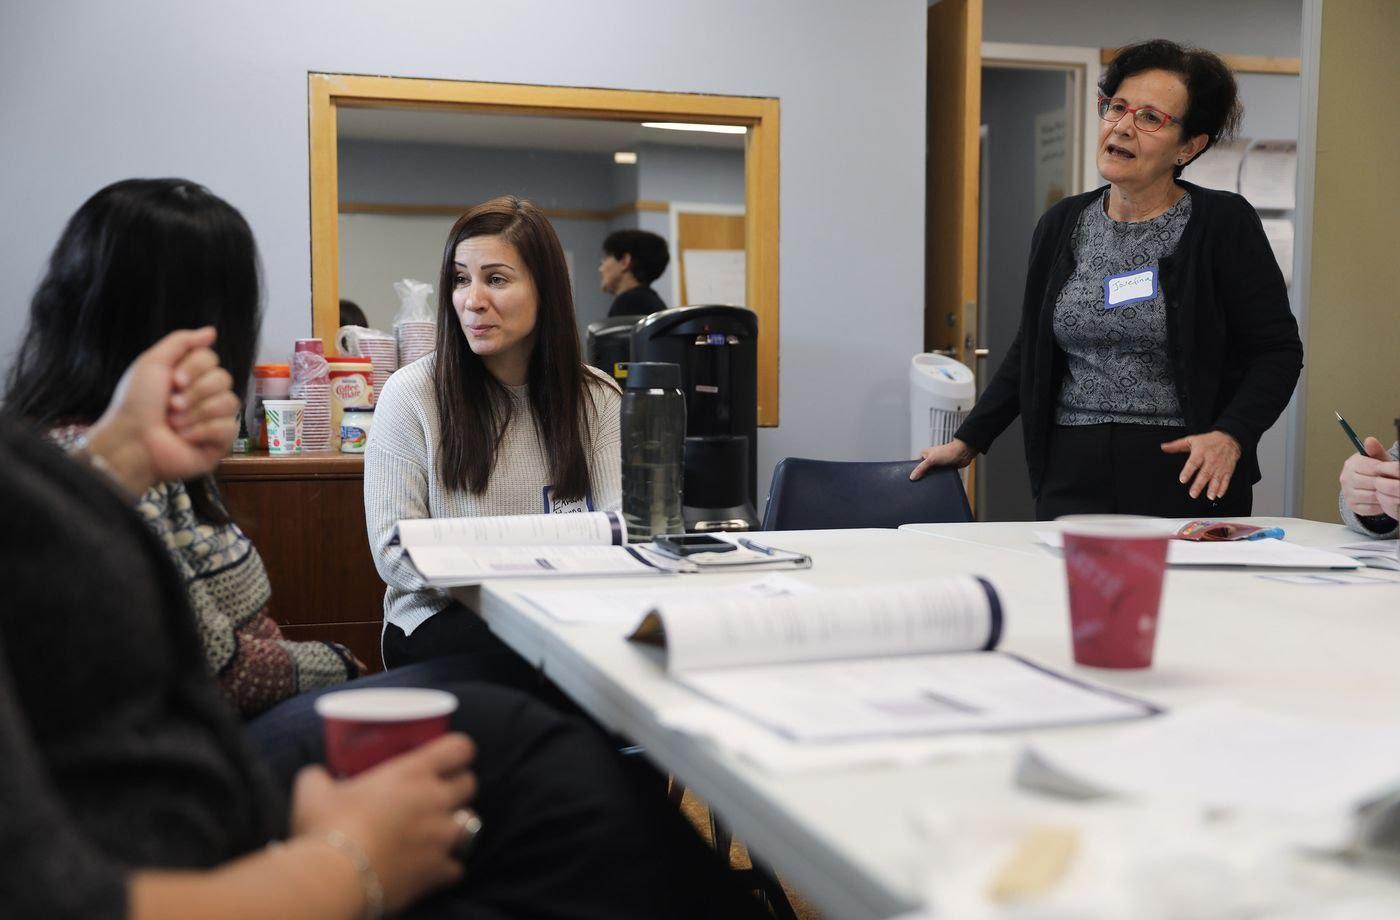 Ekram Hanna, center, and Josefina Alvarez, right, conduct a mental health training at MIRA office on Dec. 7, 2019.